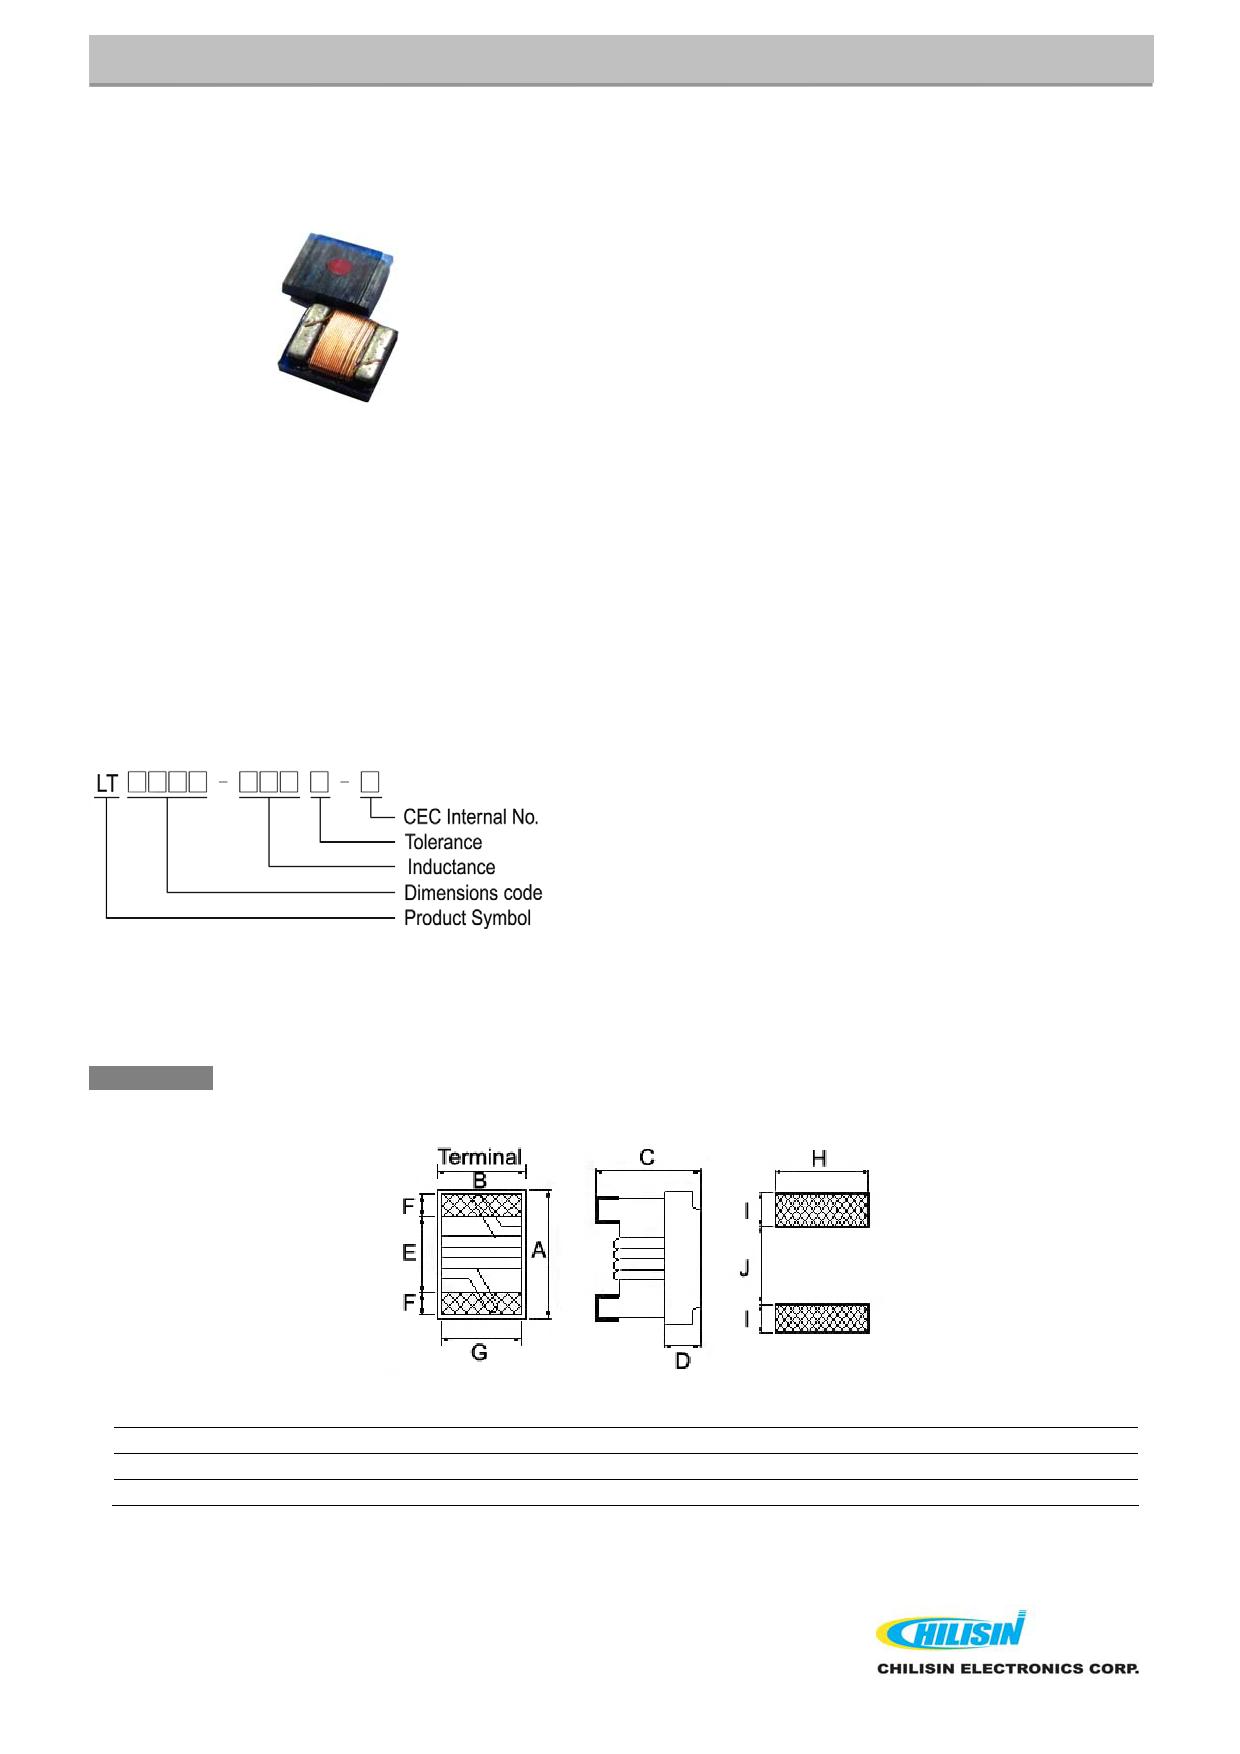 LT0805 데이터시트 및 LT0805 PDF